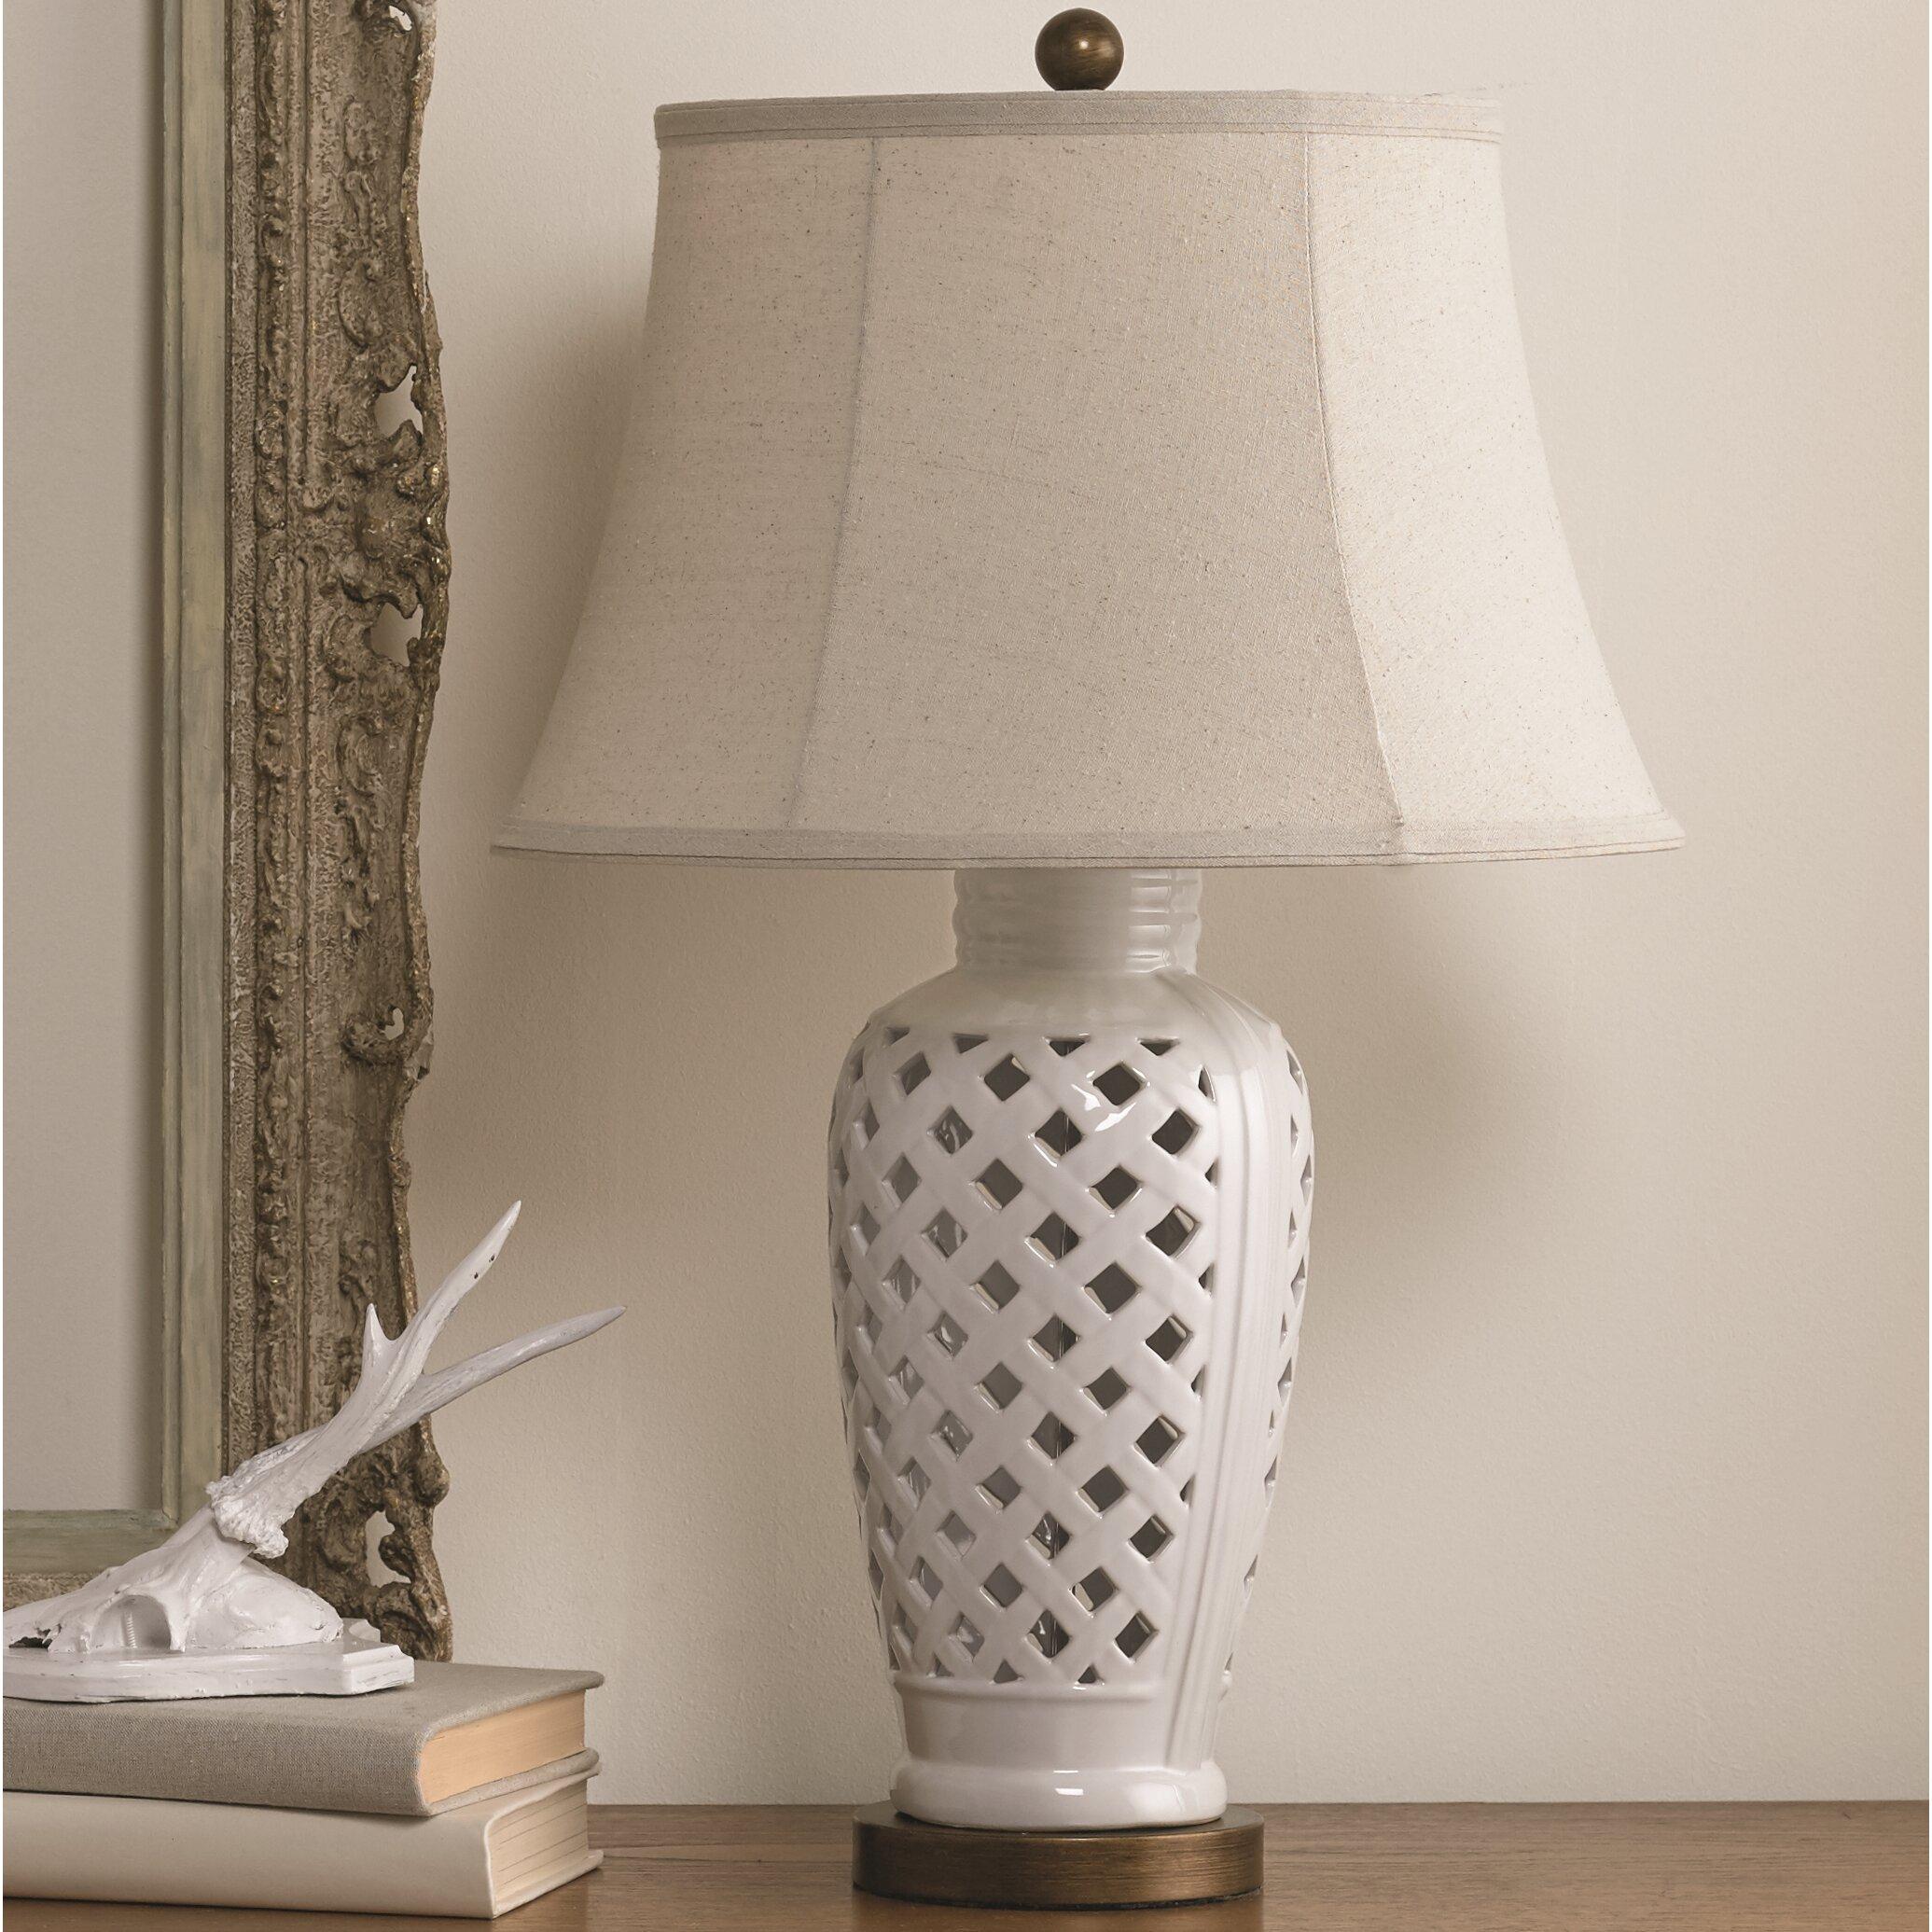 Zebra lava lamp uk - The Lighting Amp Interiors Group Capri 65cm Table Lamp